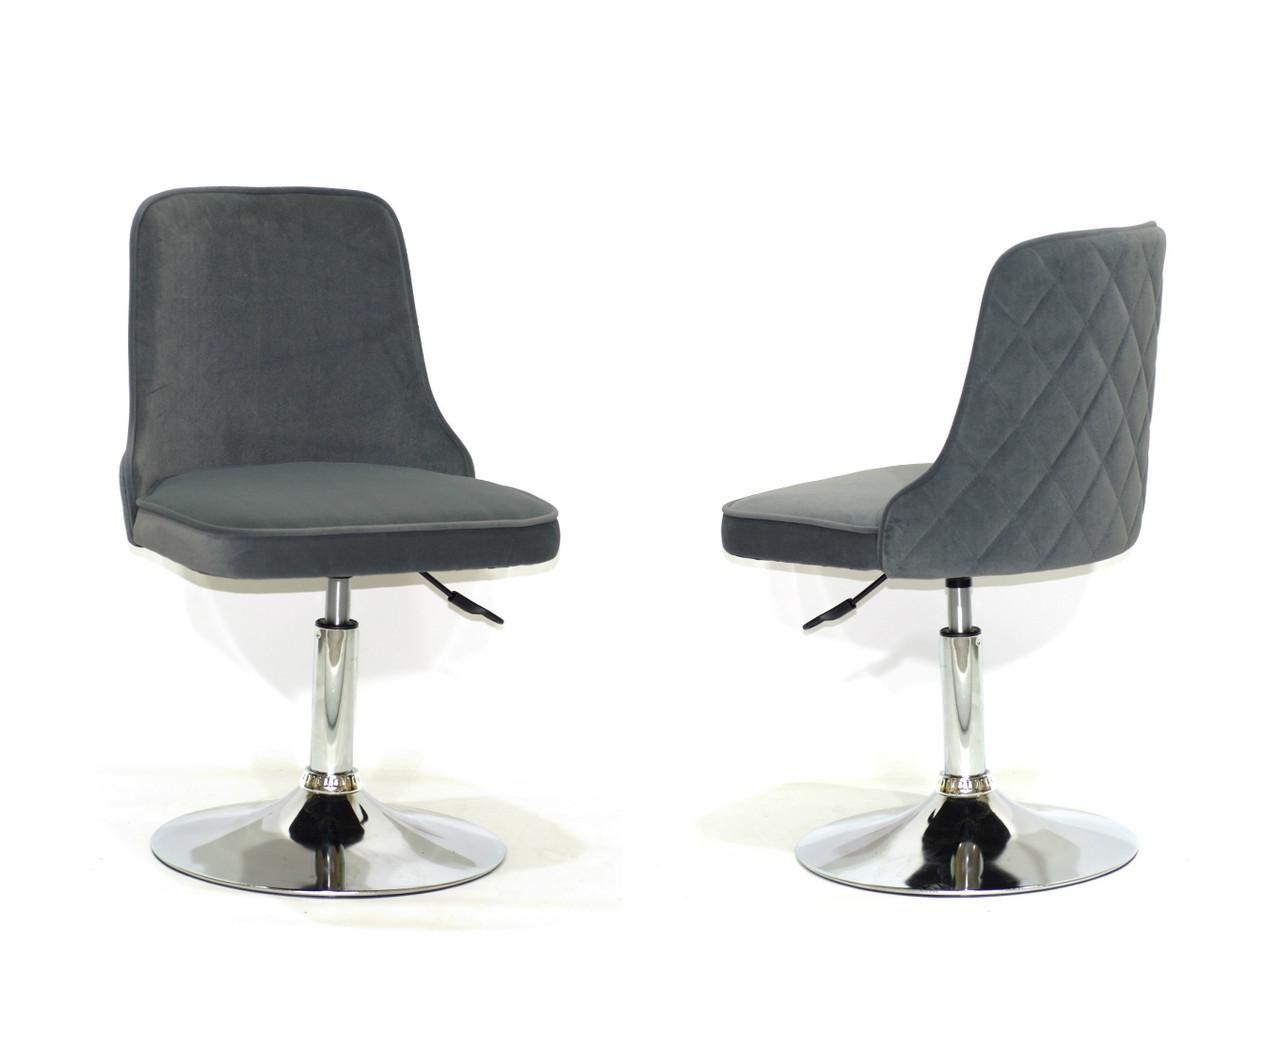 Кресло Адам ADAM CH-BASE серый бархат на блине